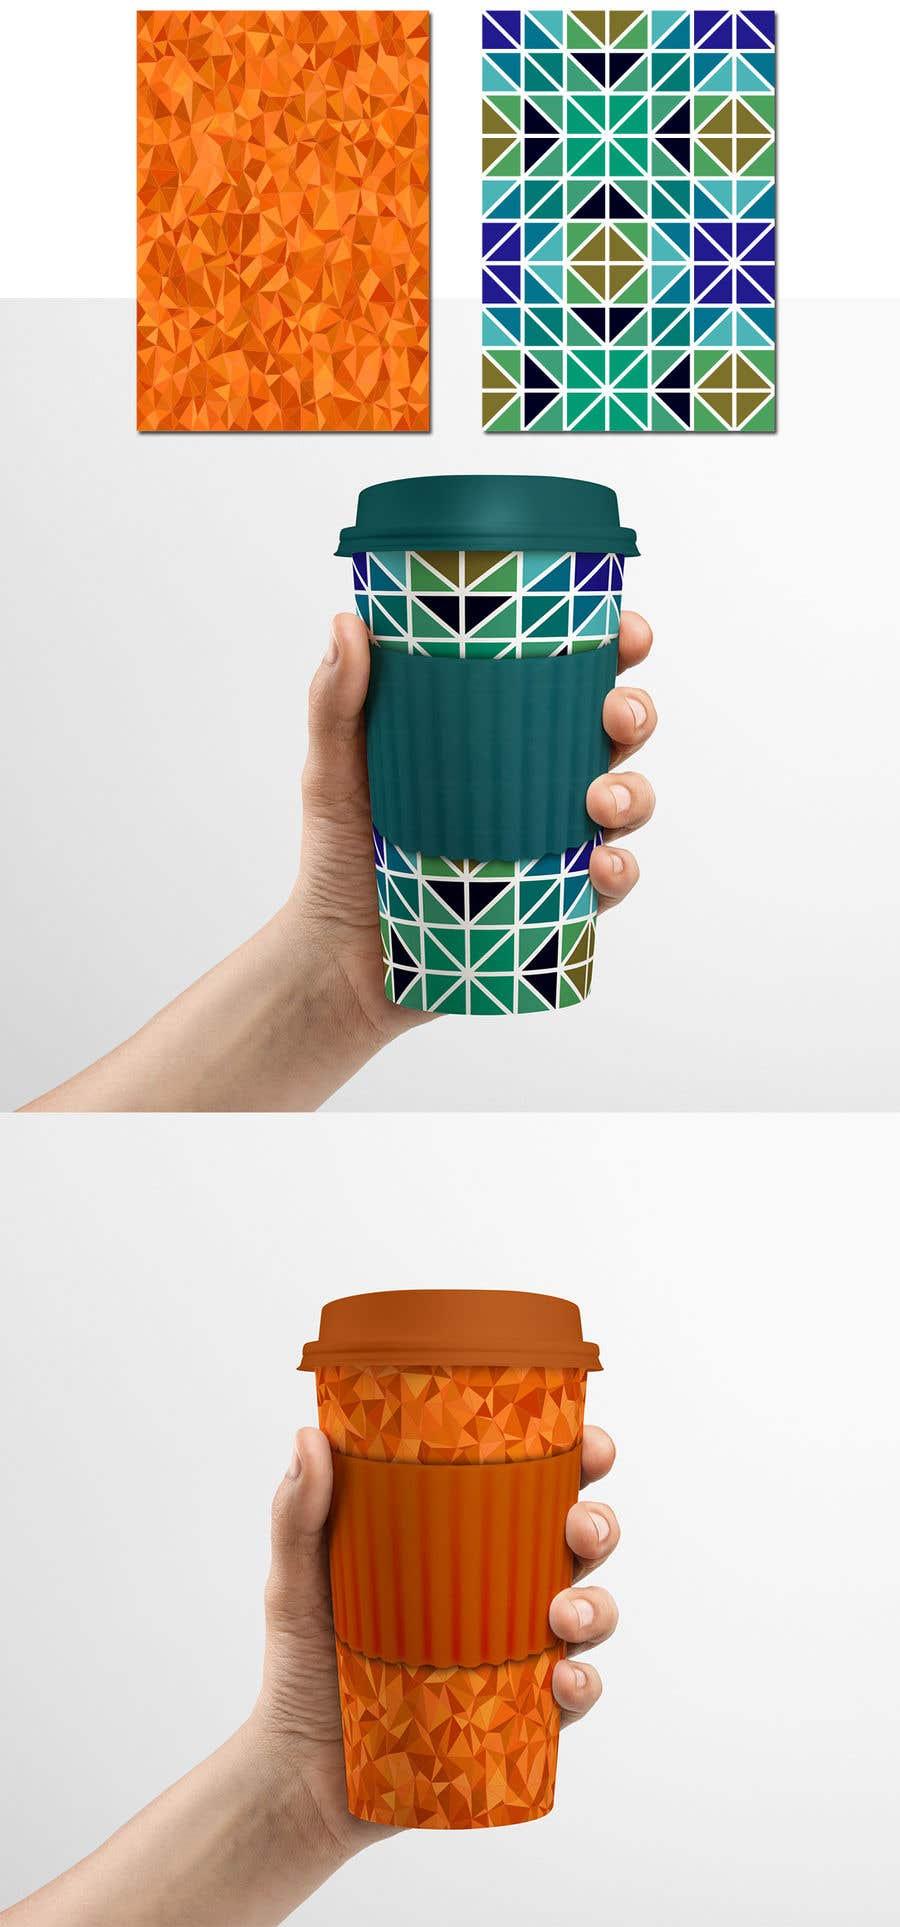 Bài tham dự cuộc thi #19 cho I need two designs for a reusable coffe mug